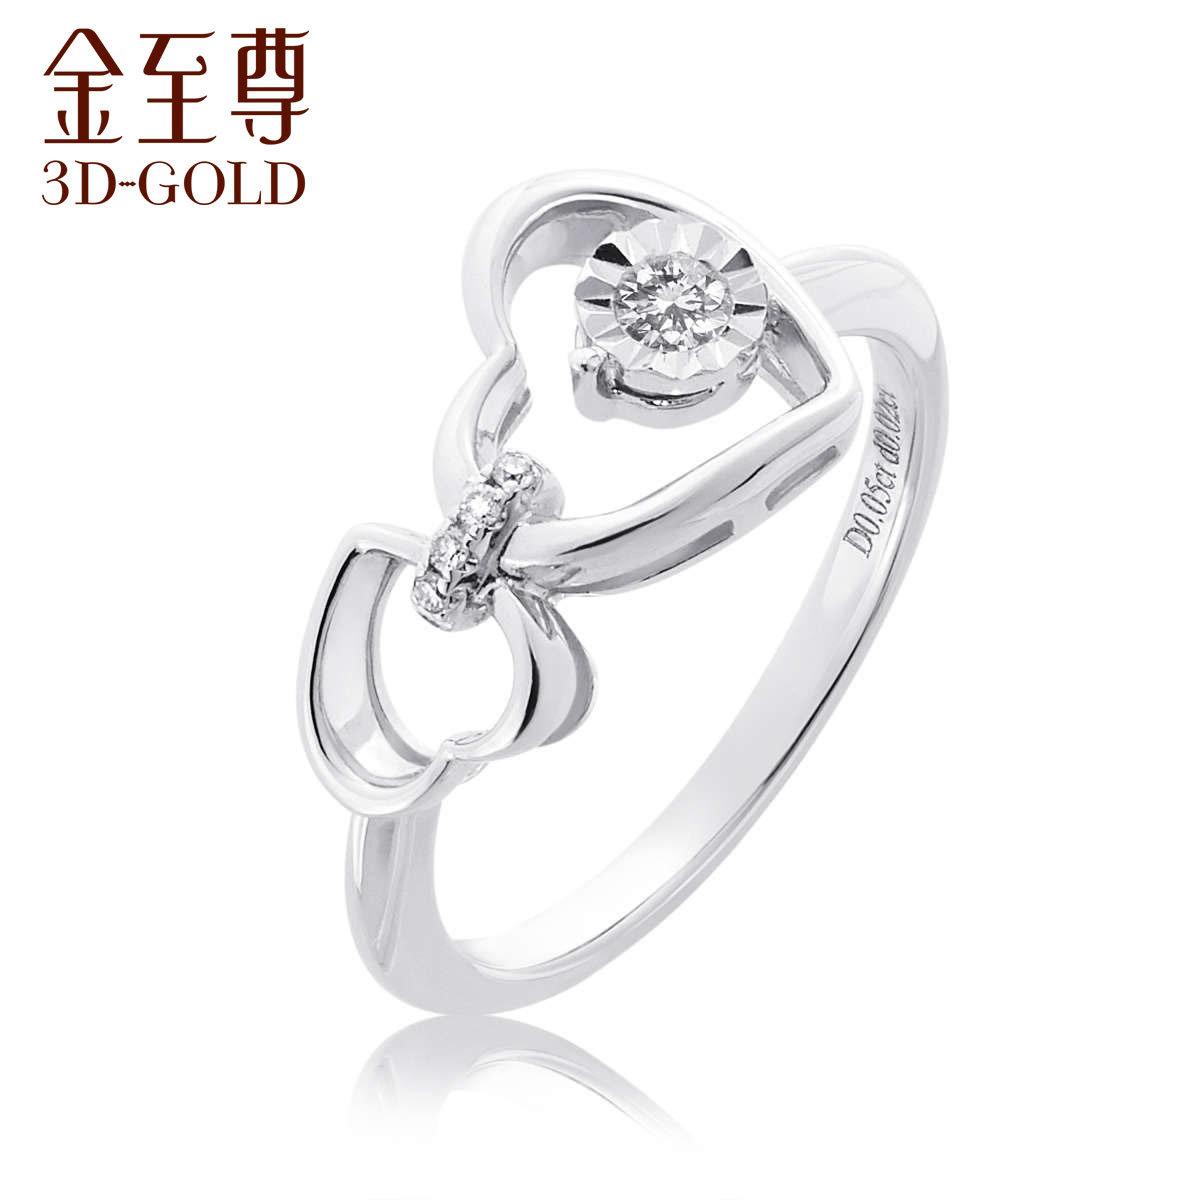 18K/750金(白色)鑲鑽石戒指